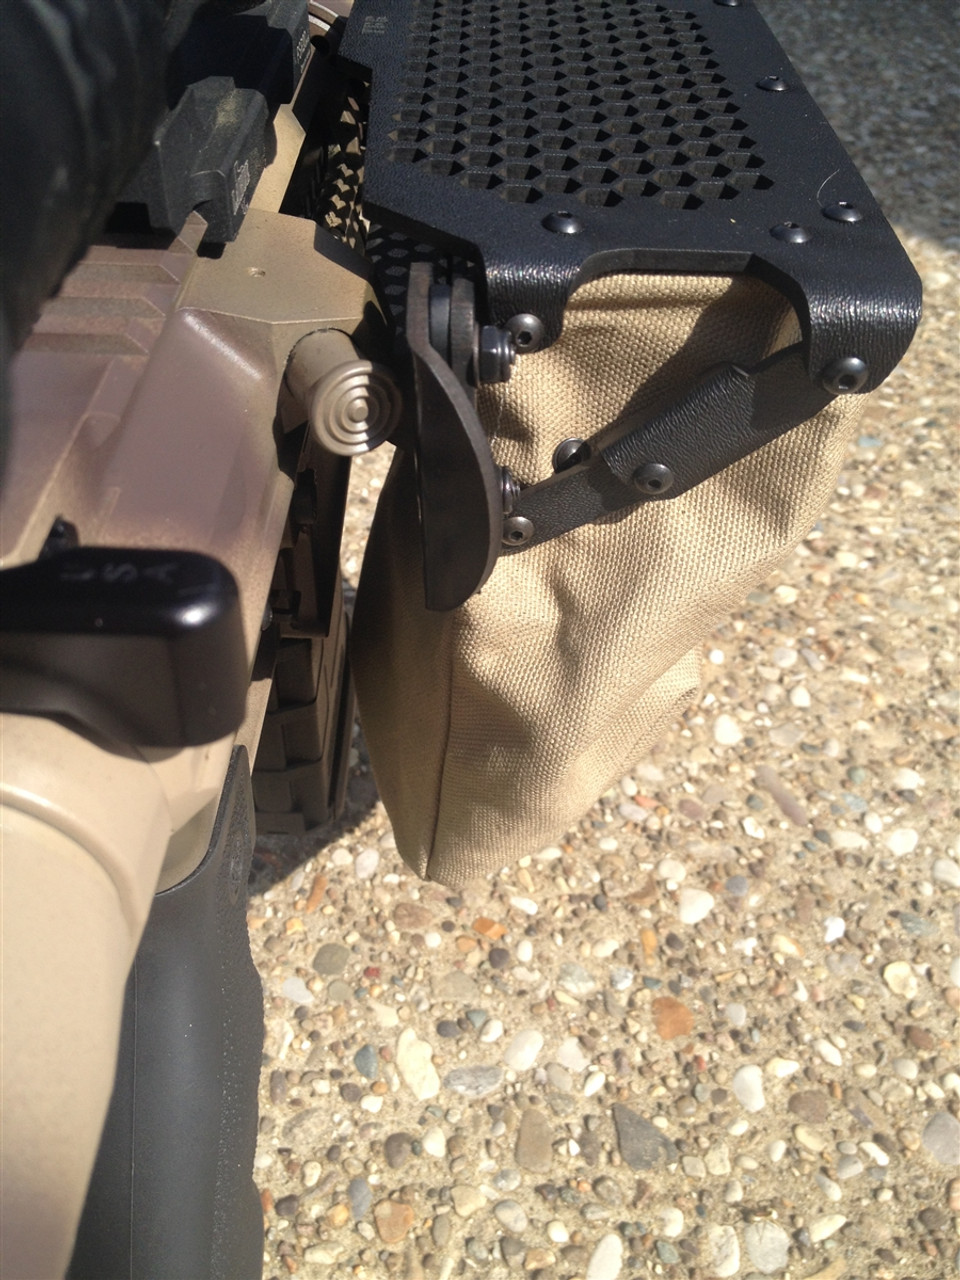 shown on DPMS LR308 with shell deflector/forward assist combination. Khaki/tan fabric.